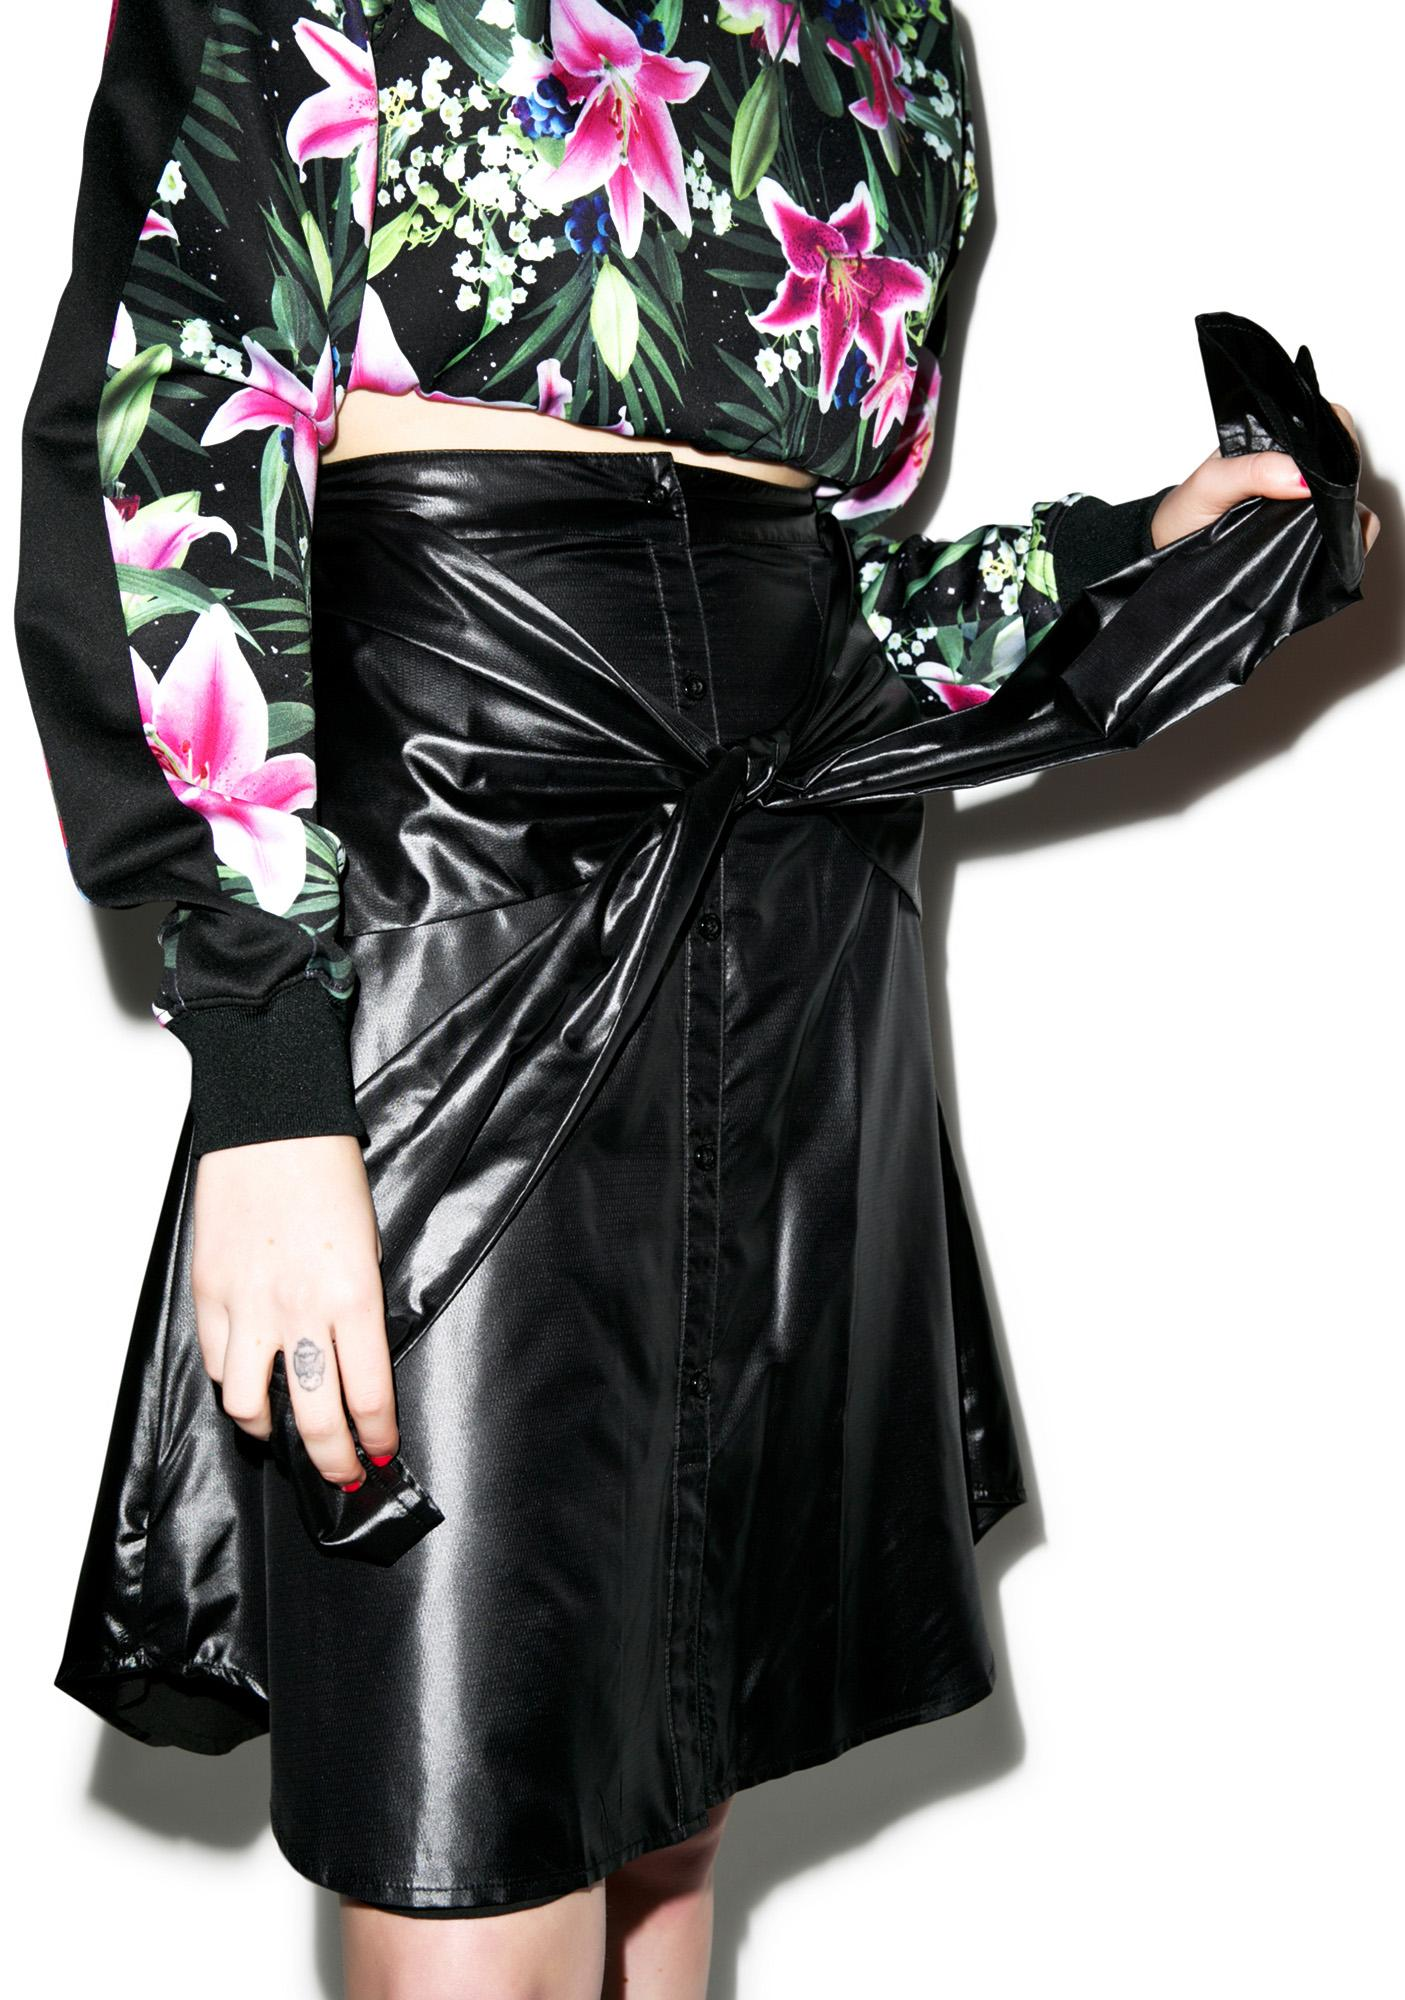 Joyrich Future City Skirt